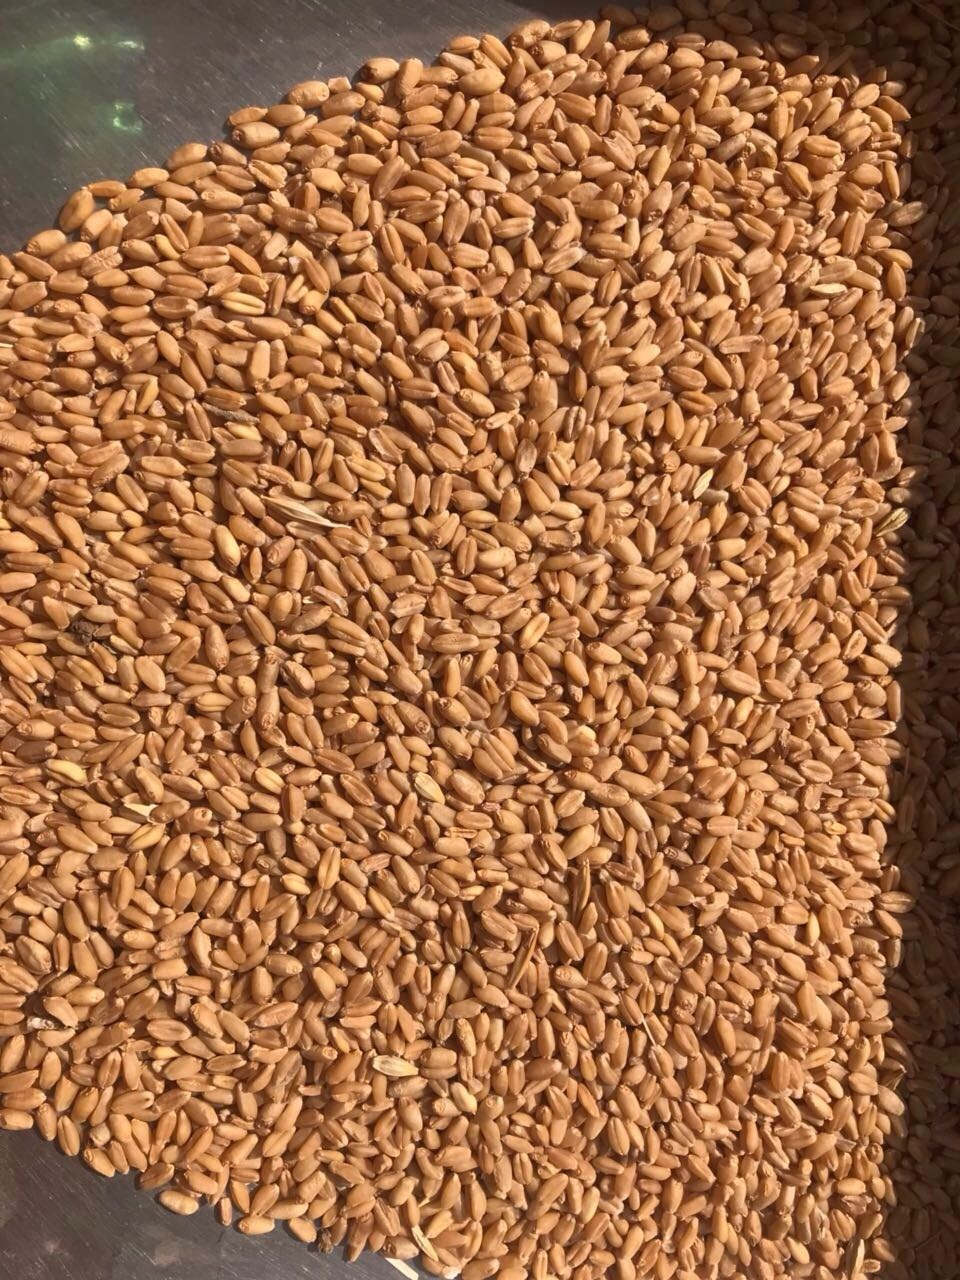 Feed Grain Agri Brokers: PAKISTAN ORIGIN MILLING WHEAT SPECIFICATION